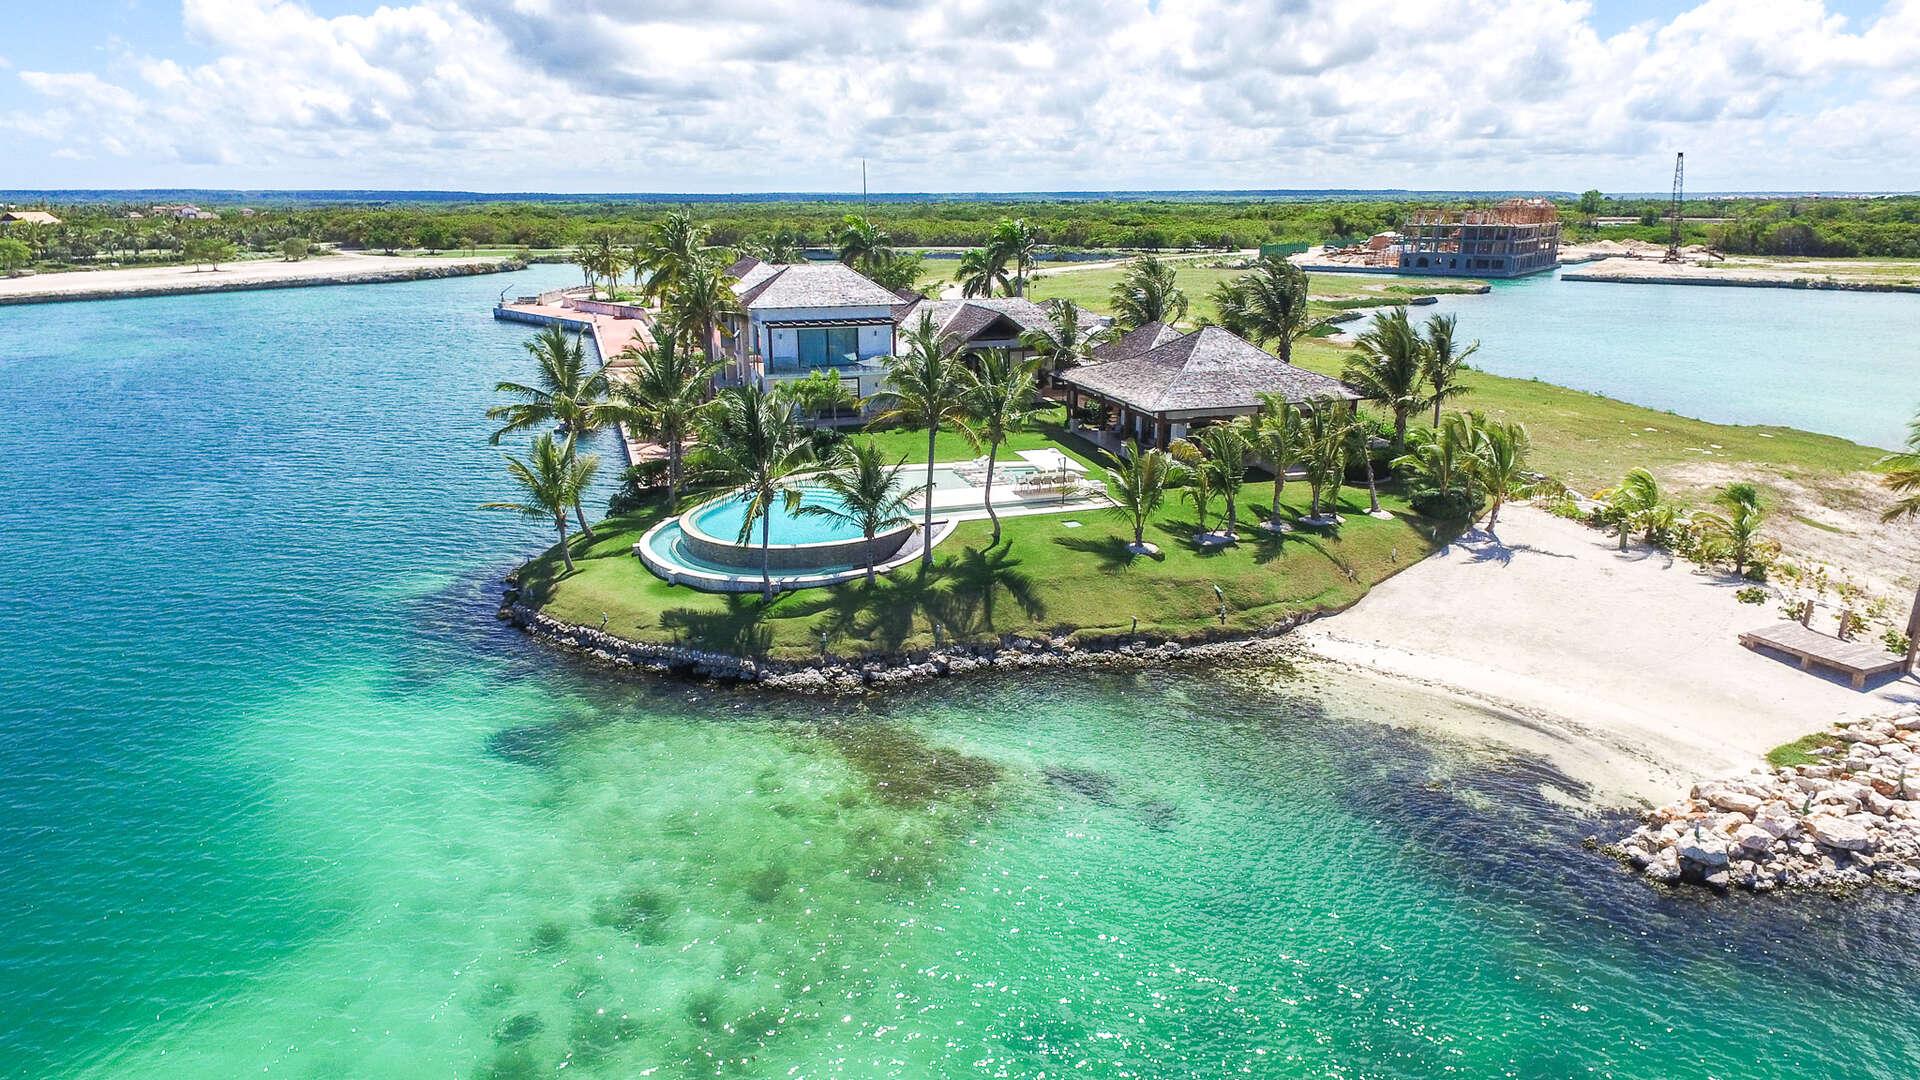 Luxury villa rentals caribbean - Dominican republic - Punta cana - Cap cana - Villa Varadero - Image 1/25